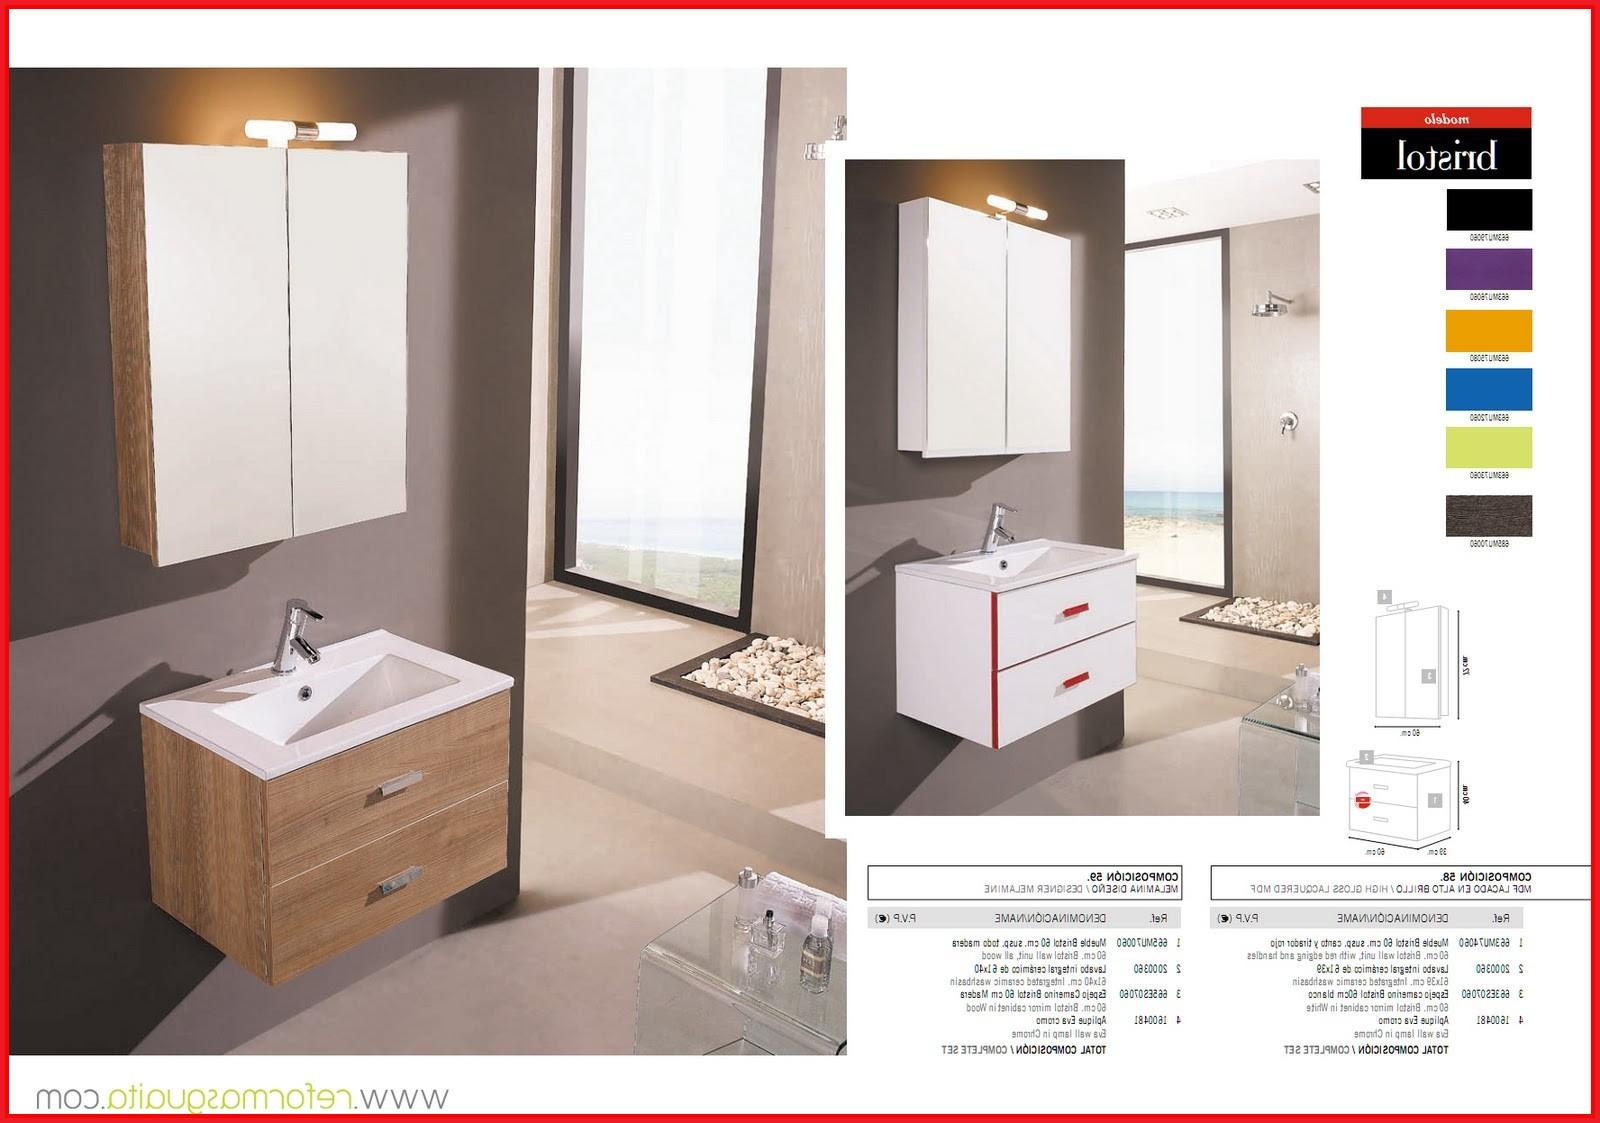 Muebles De Baño Blanco S1du Muebles De Baà O En Blanco Mueble BaO Line Muebles De Espejo